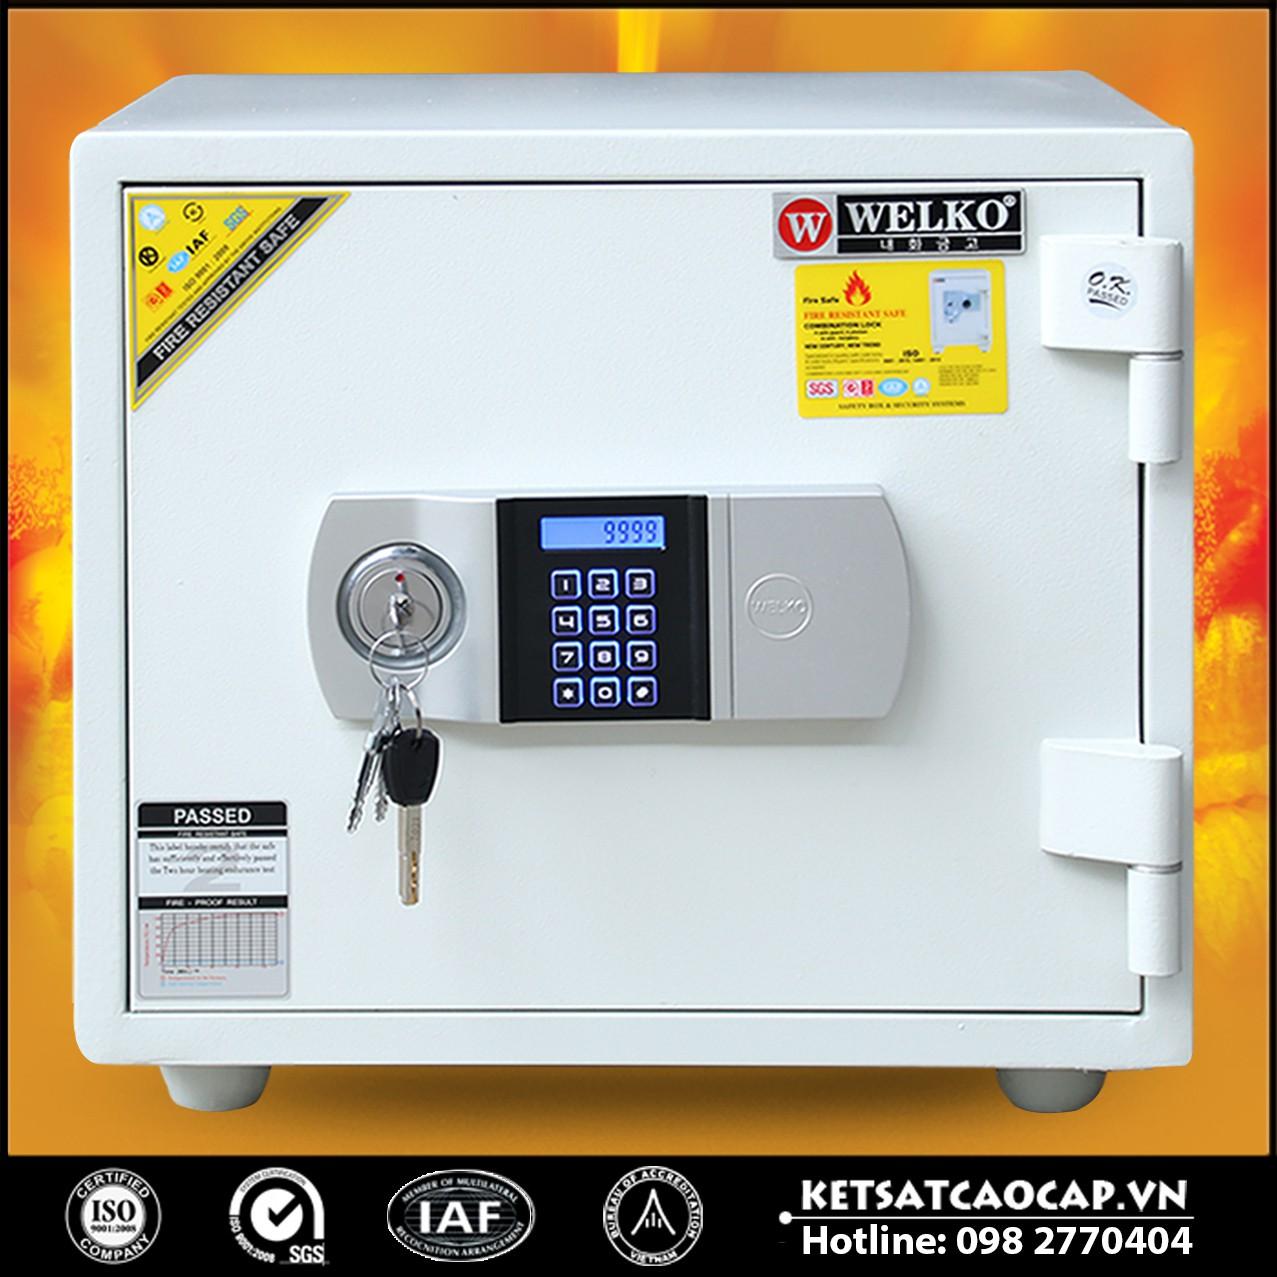 Két Sắt Giá Rẻ LX360 E Silver - White